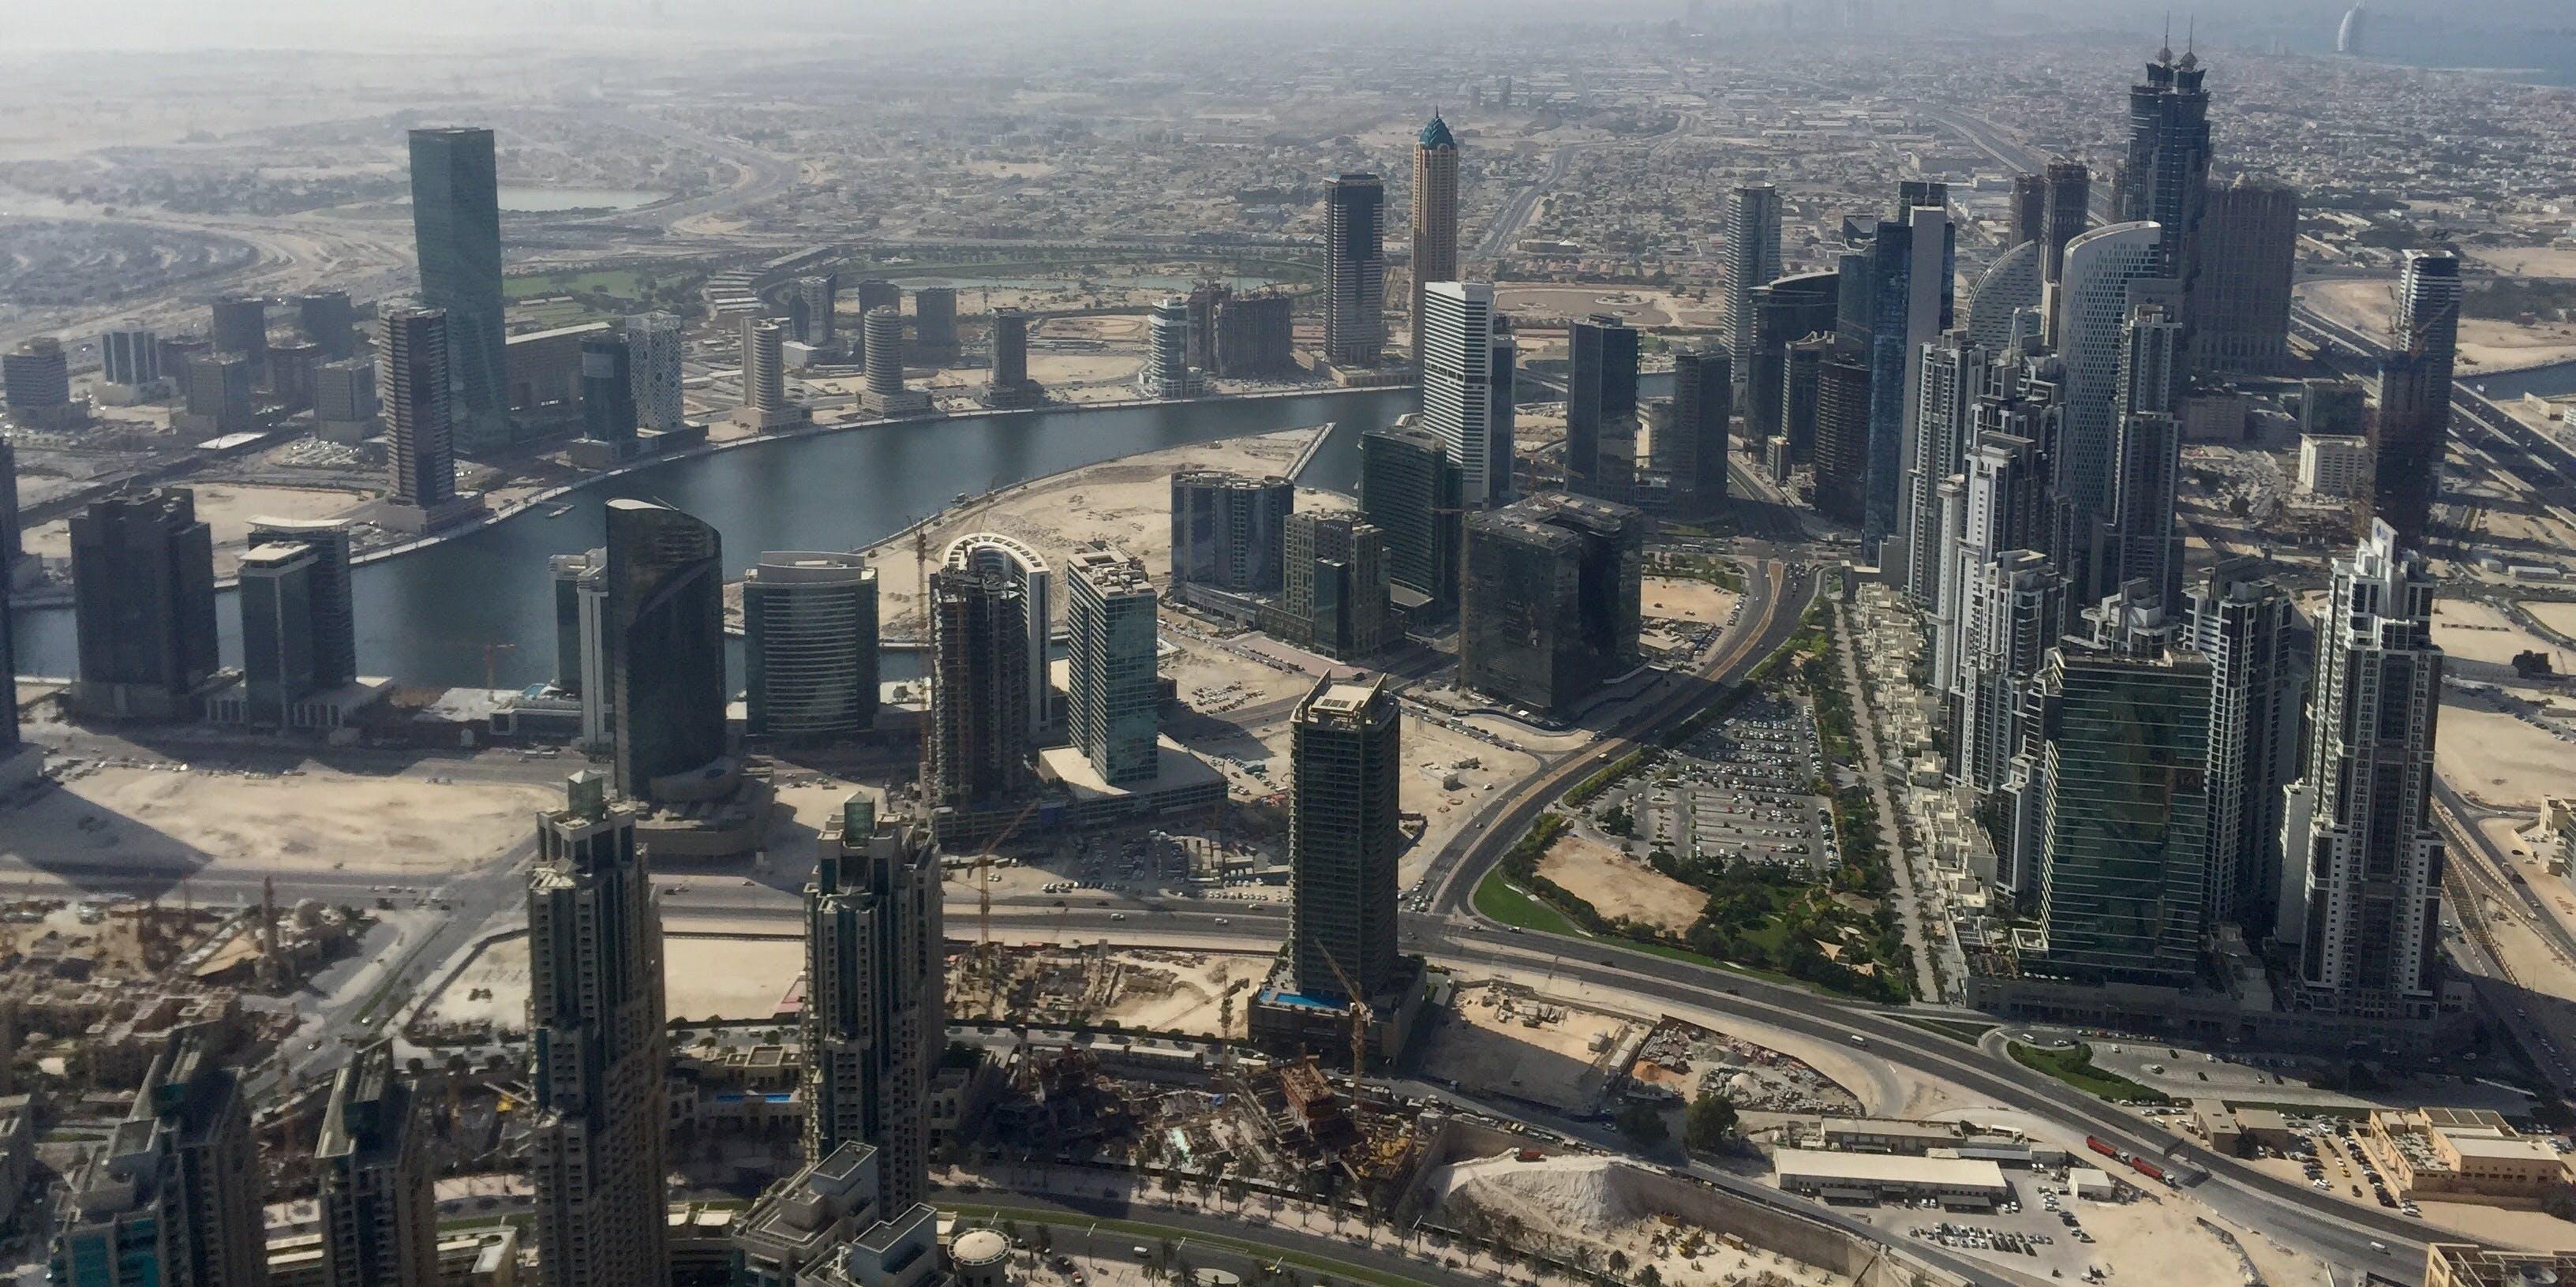 Dubuai's rapidly changing landscape includes an expanded Dubai Canal.